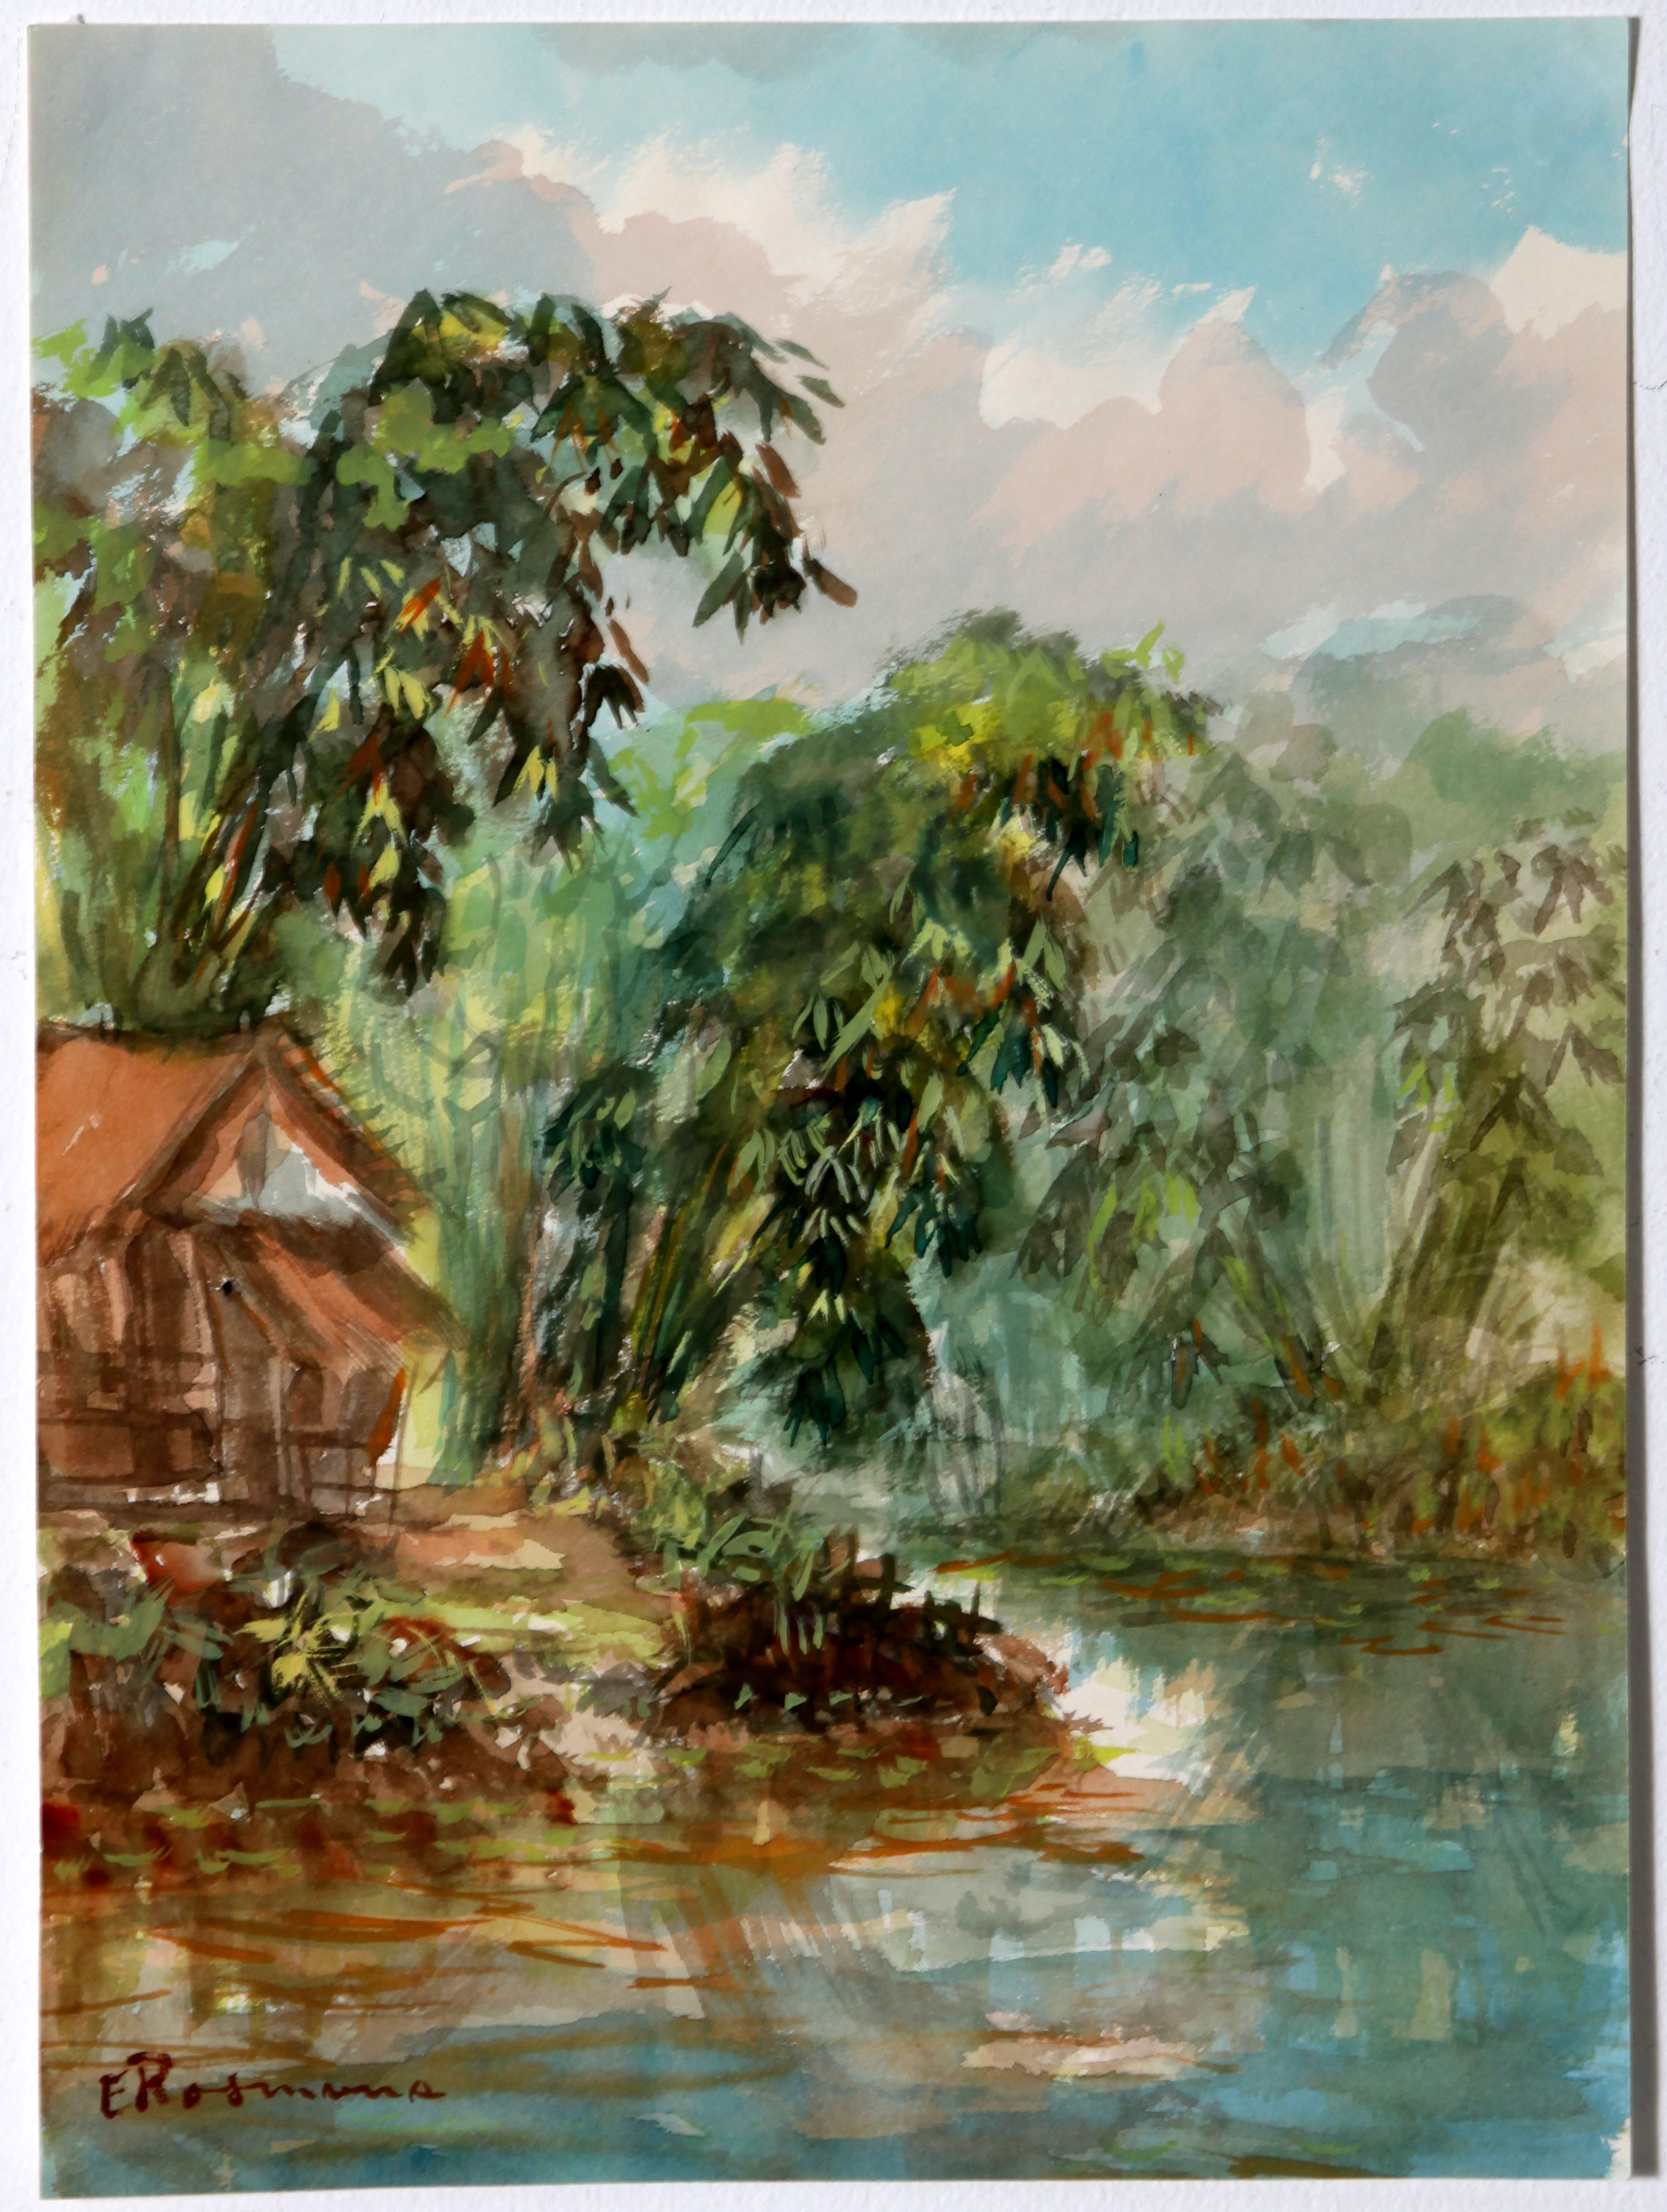 Original Signed Tropical Watercolor by Rosmana